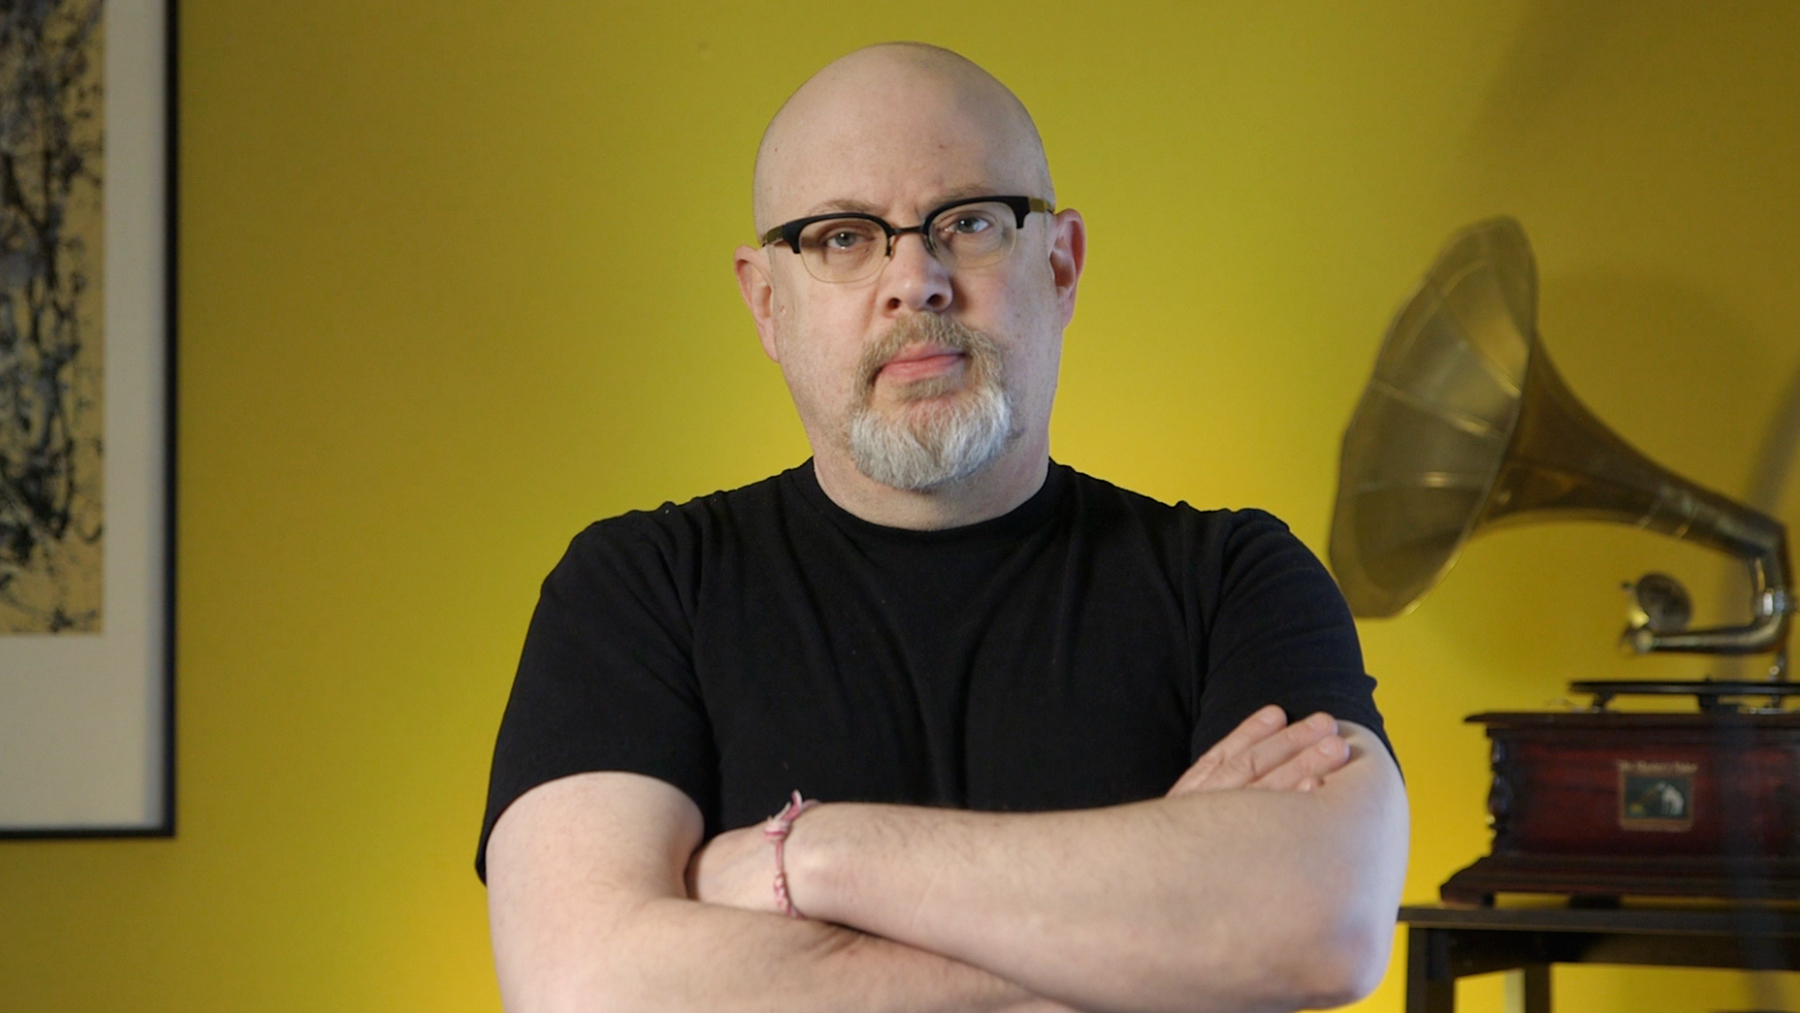 Professor Jay Rosenstein. Photo coutesy of himself.